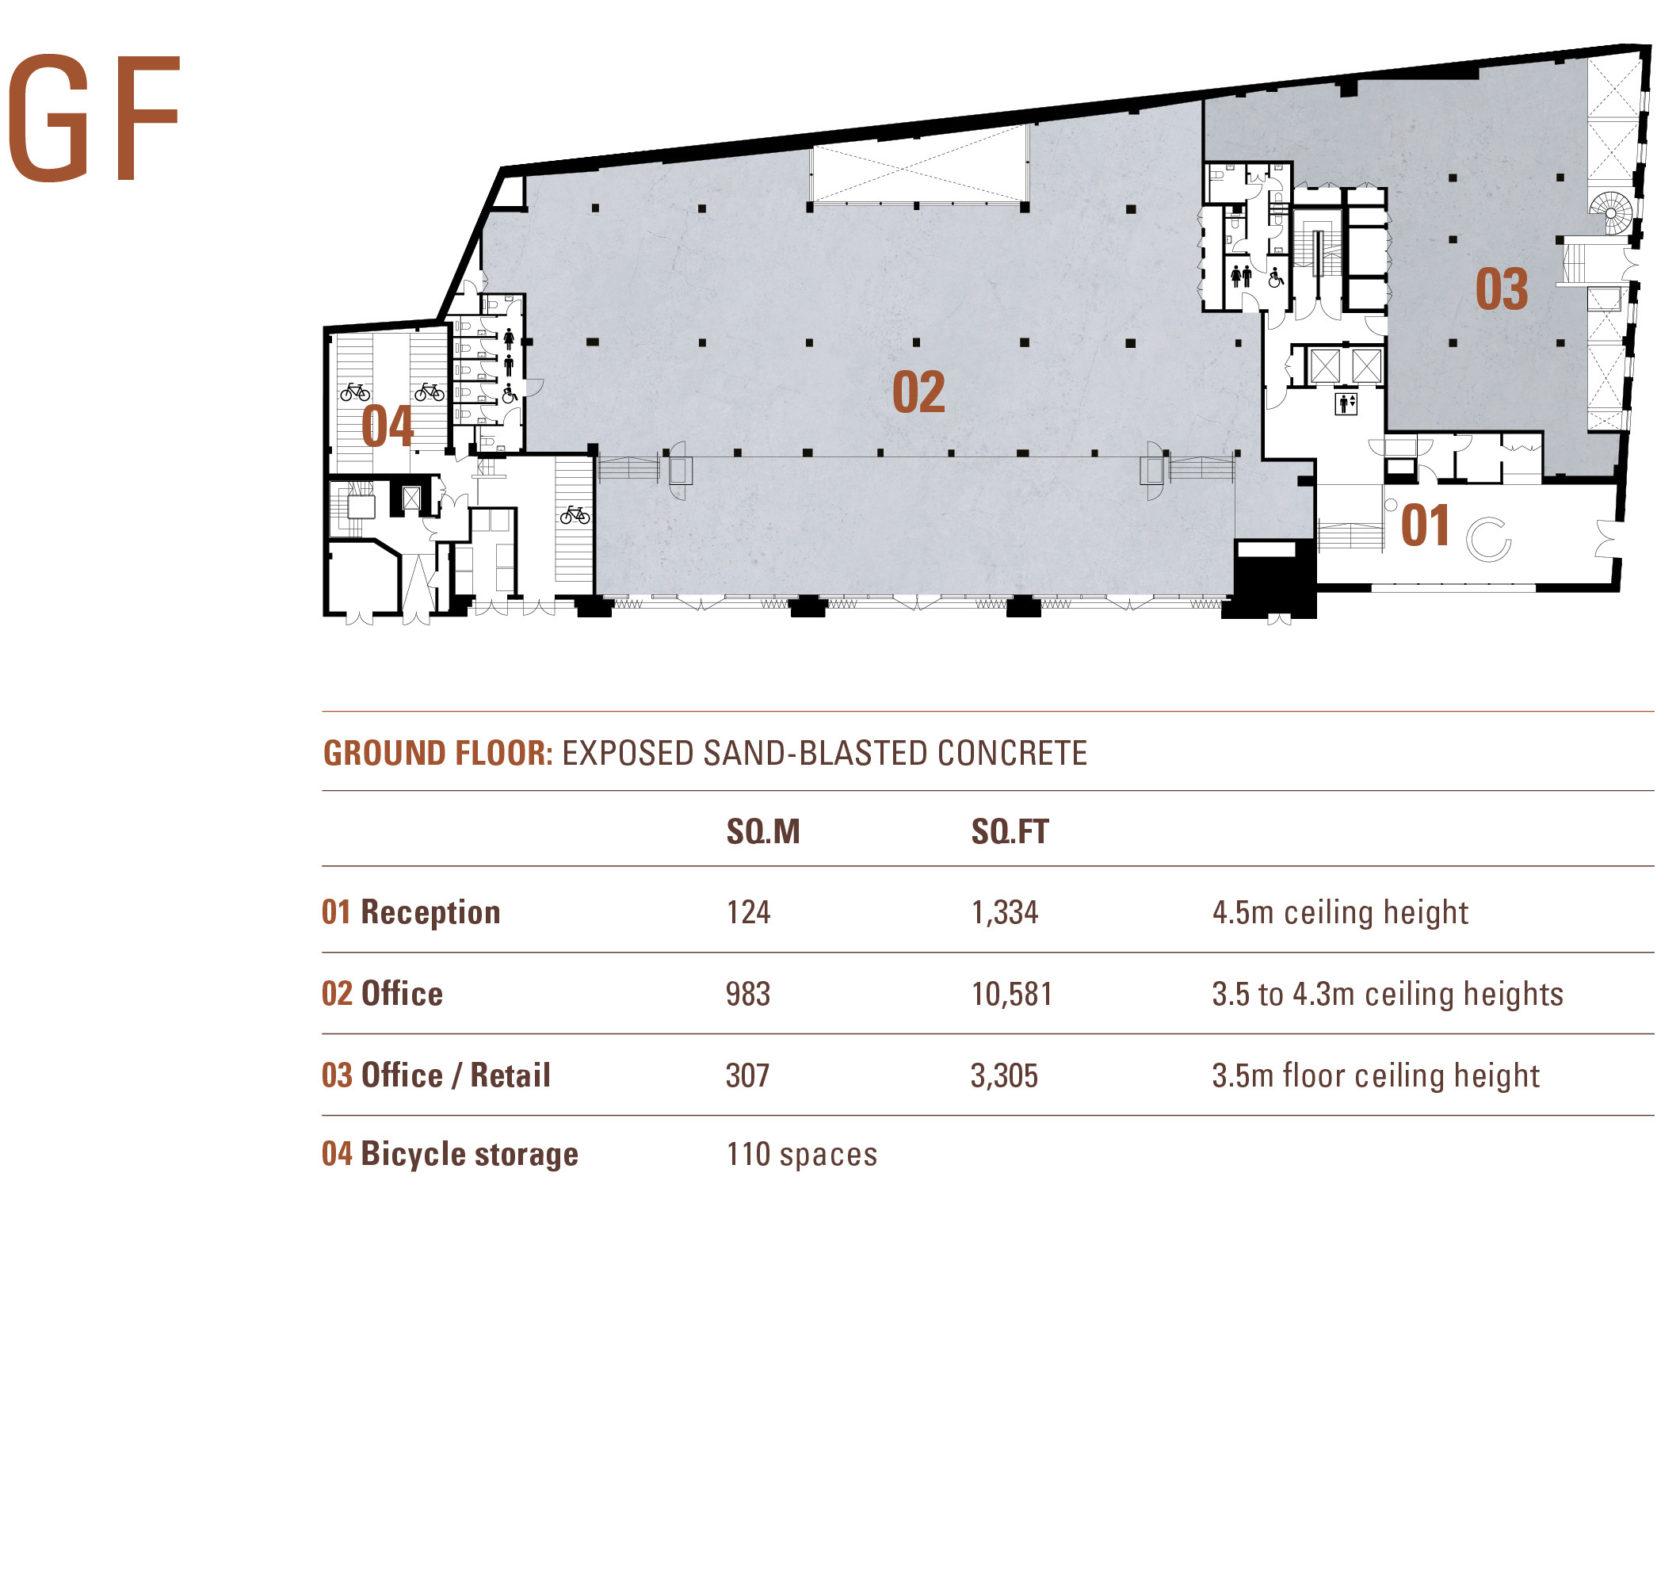 Floorplan gf v2